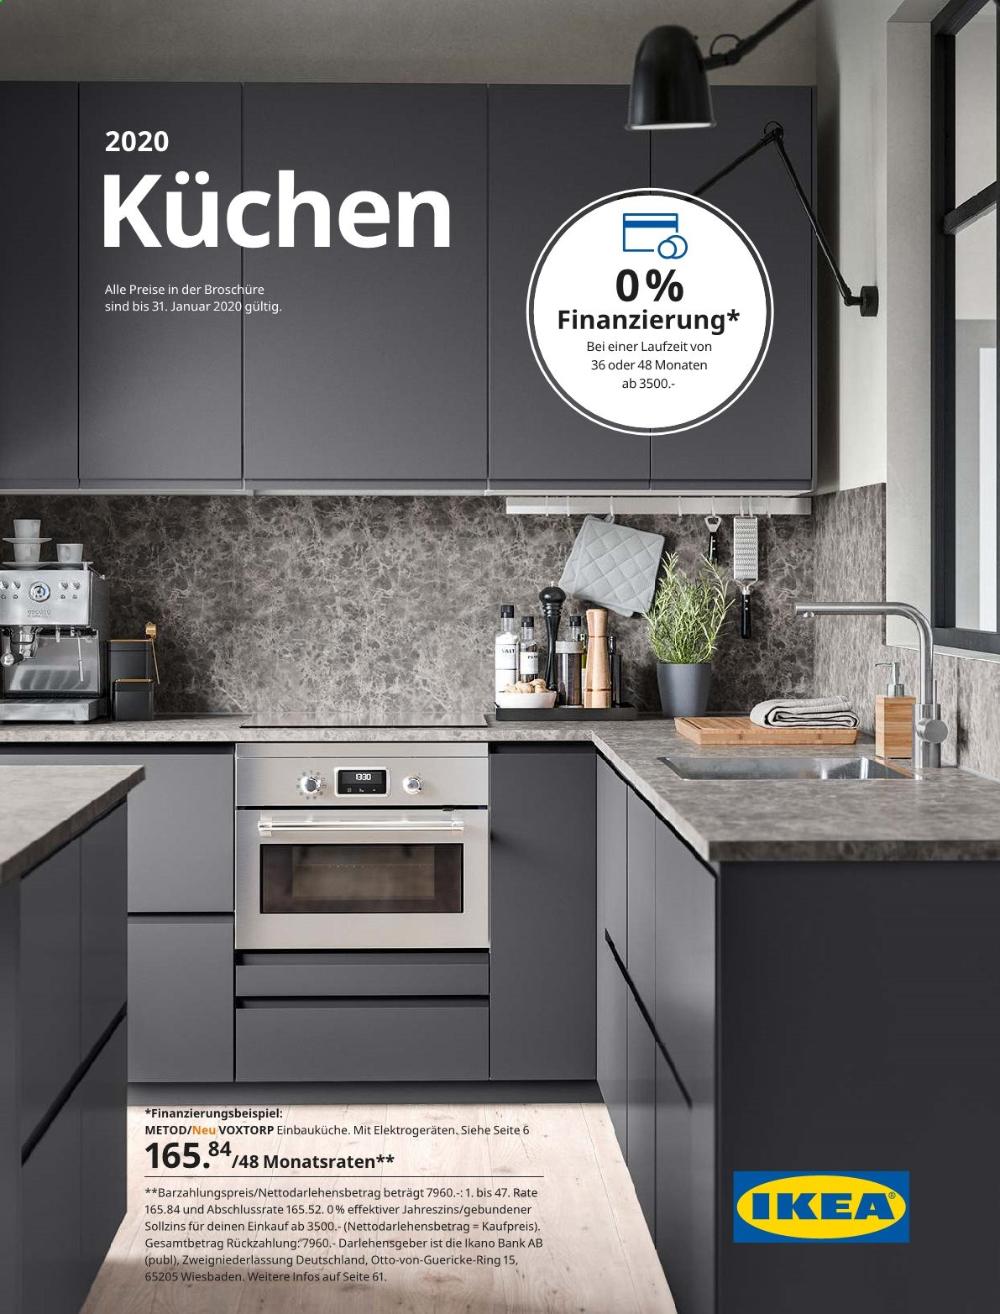 IKEA aktuelles Prospekt 122.122.122012122   122.12.12201220   Rabatt kompass.de ...